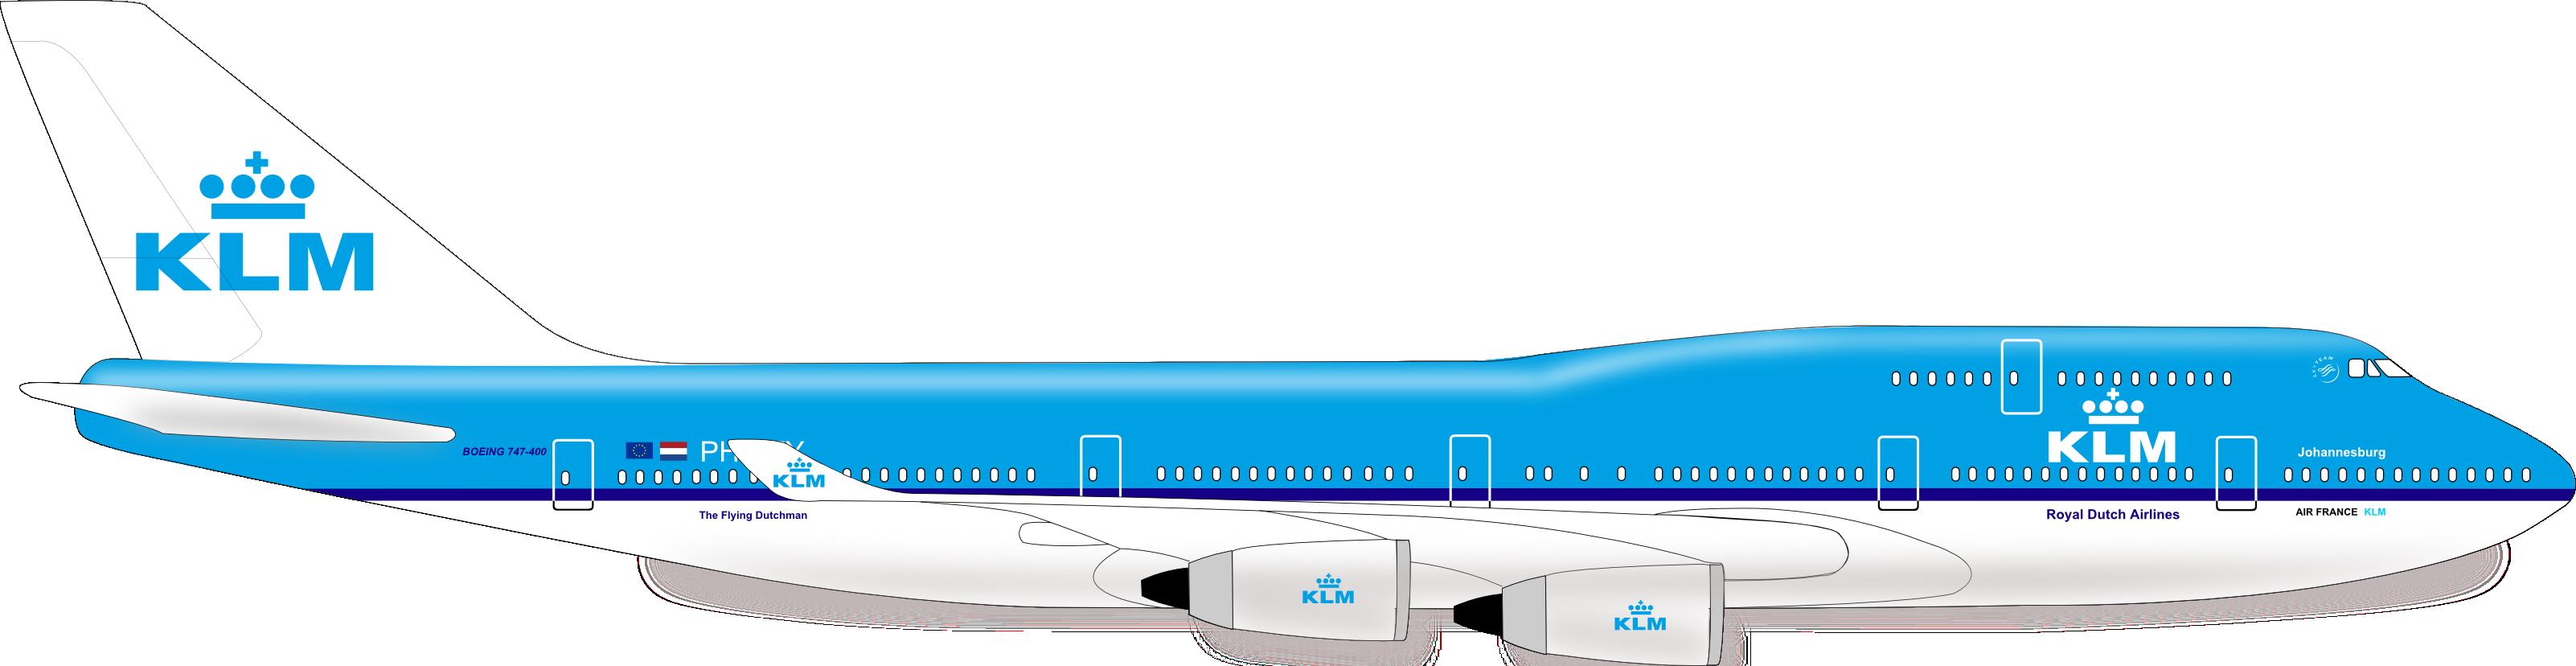 Boeing Transparent Images PNG